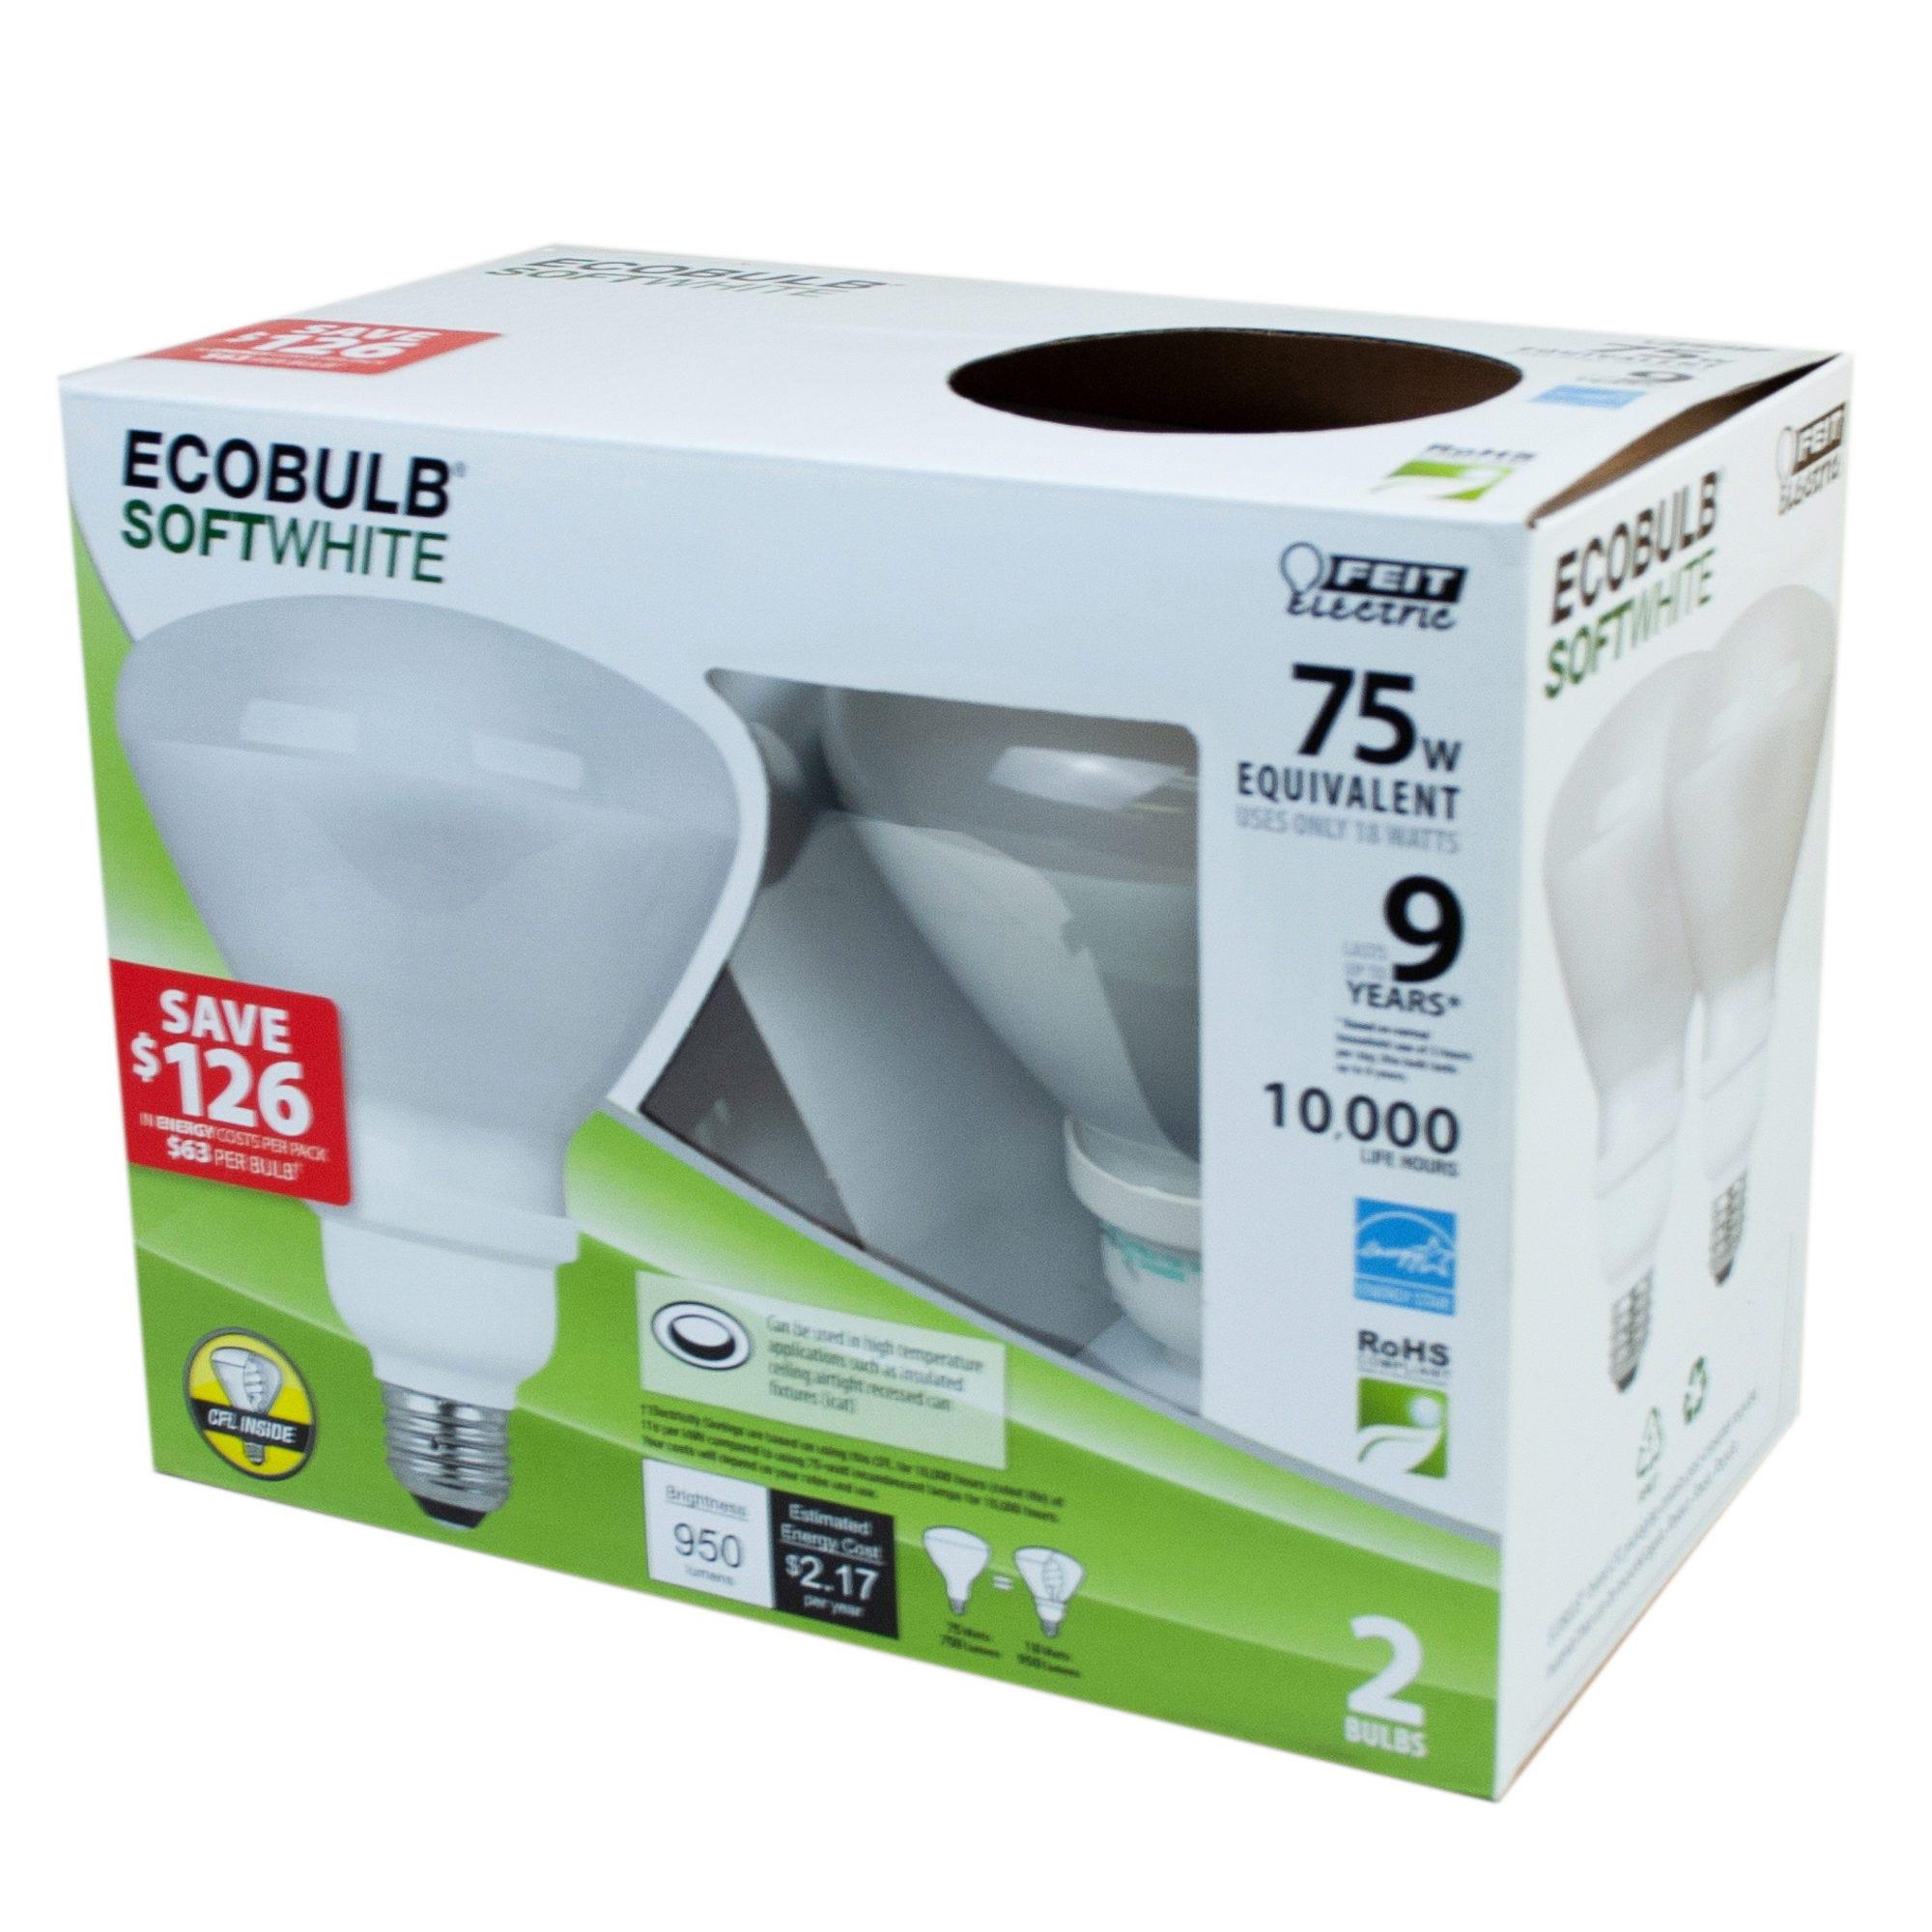 EcoBULB 2 Pk Soft White 75 Watt Equiv. CFL LIGHT BULBS Displ- Qty 6